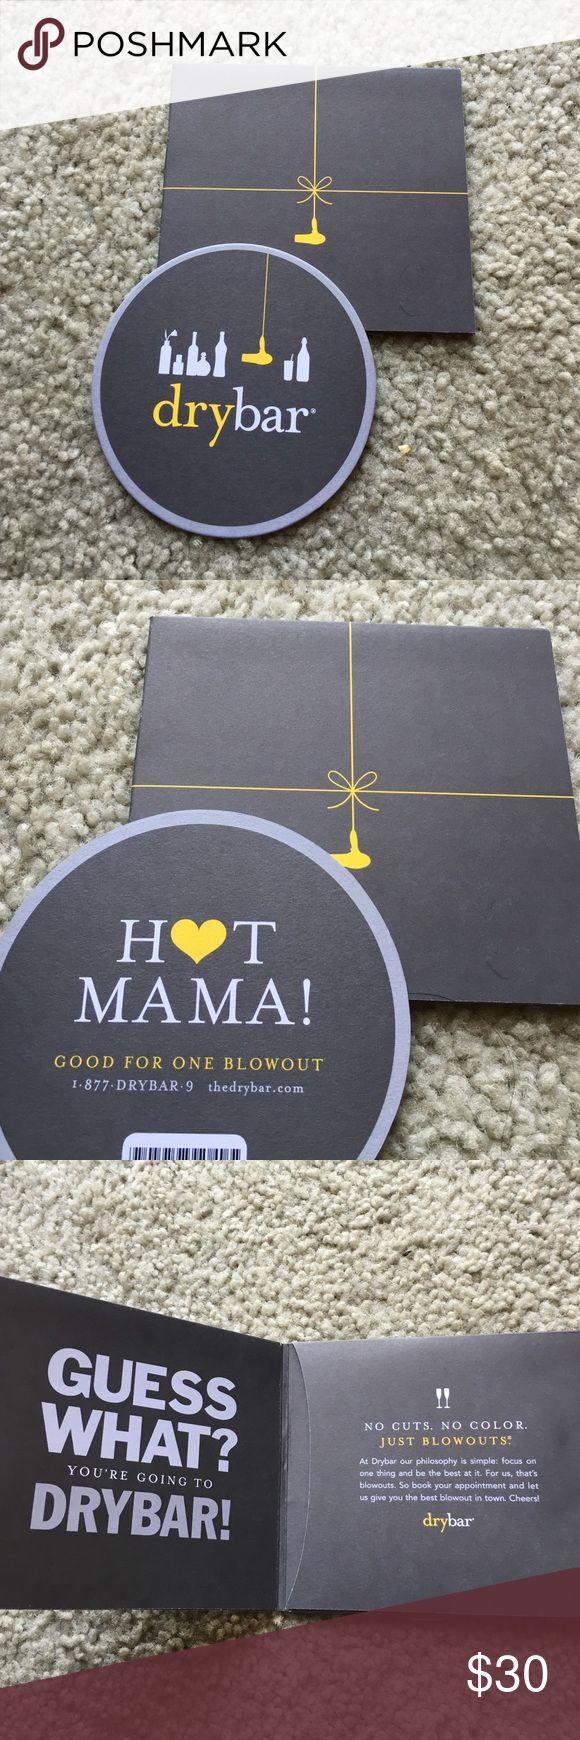 Hot Mama drybar blowout gift certificate Free blowout gift certificate! Just never going to use Other